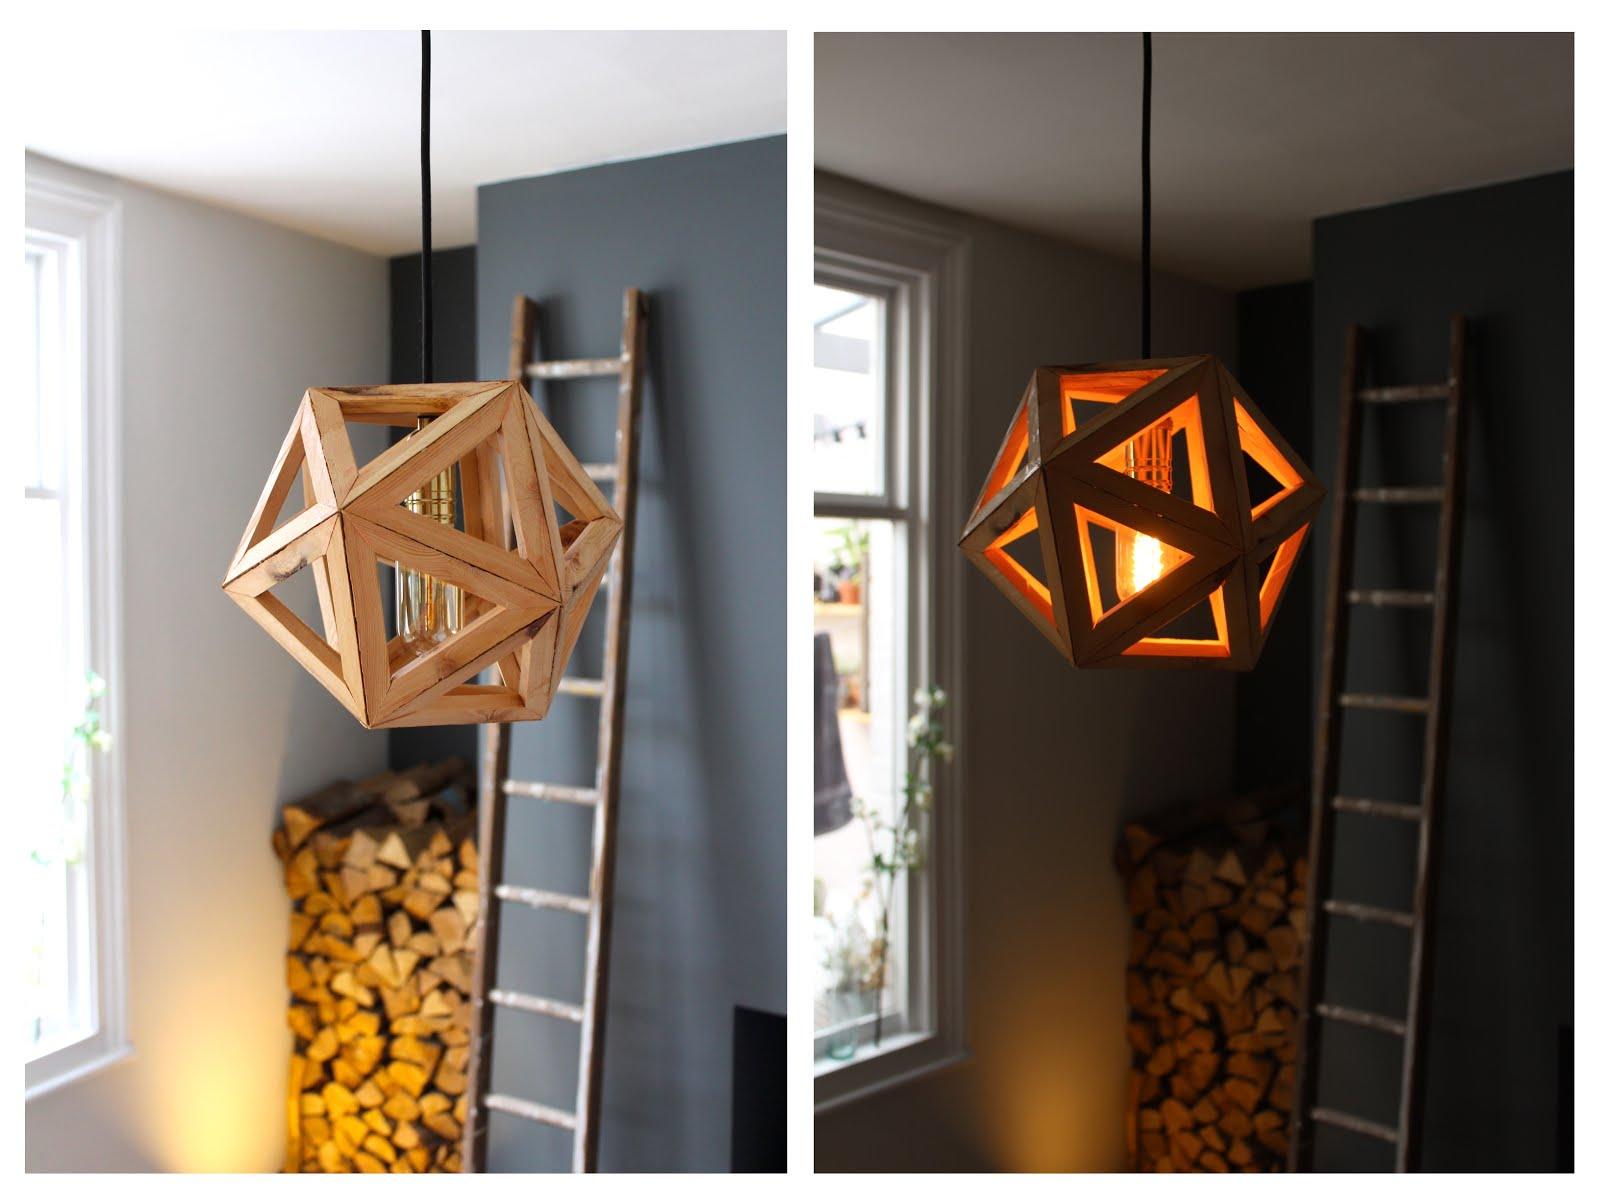 icosahedron geometric ceiling light DIY